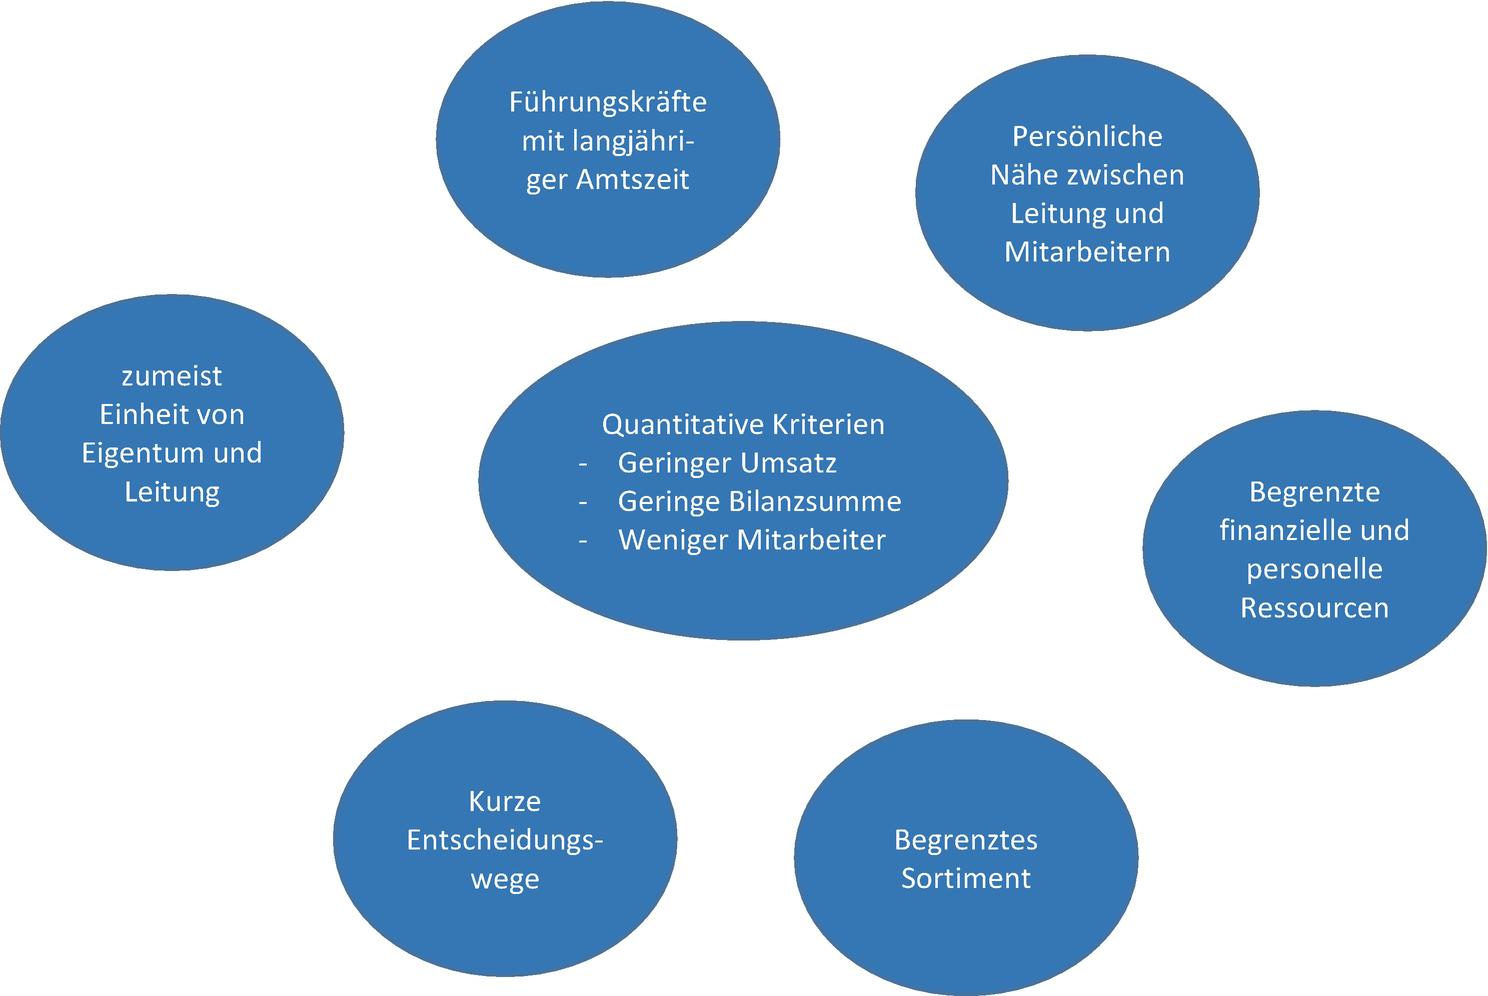 Kpis Fur Ein Corporate Governance Dashboard 9